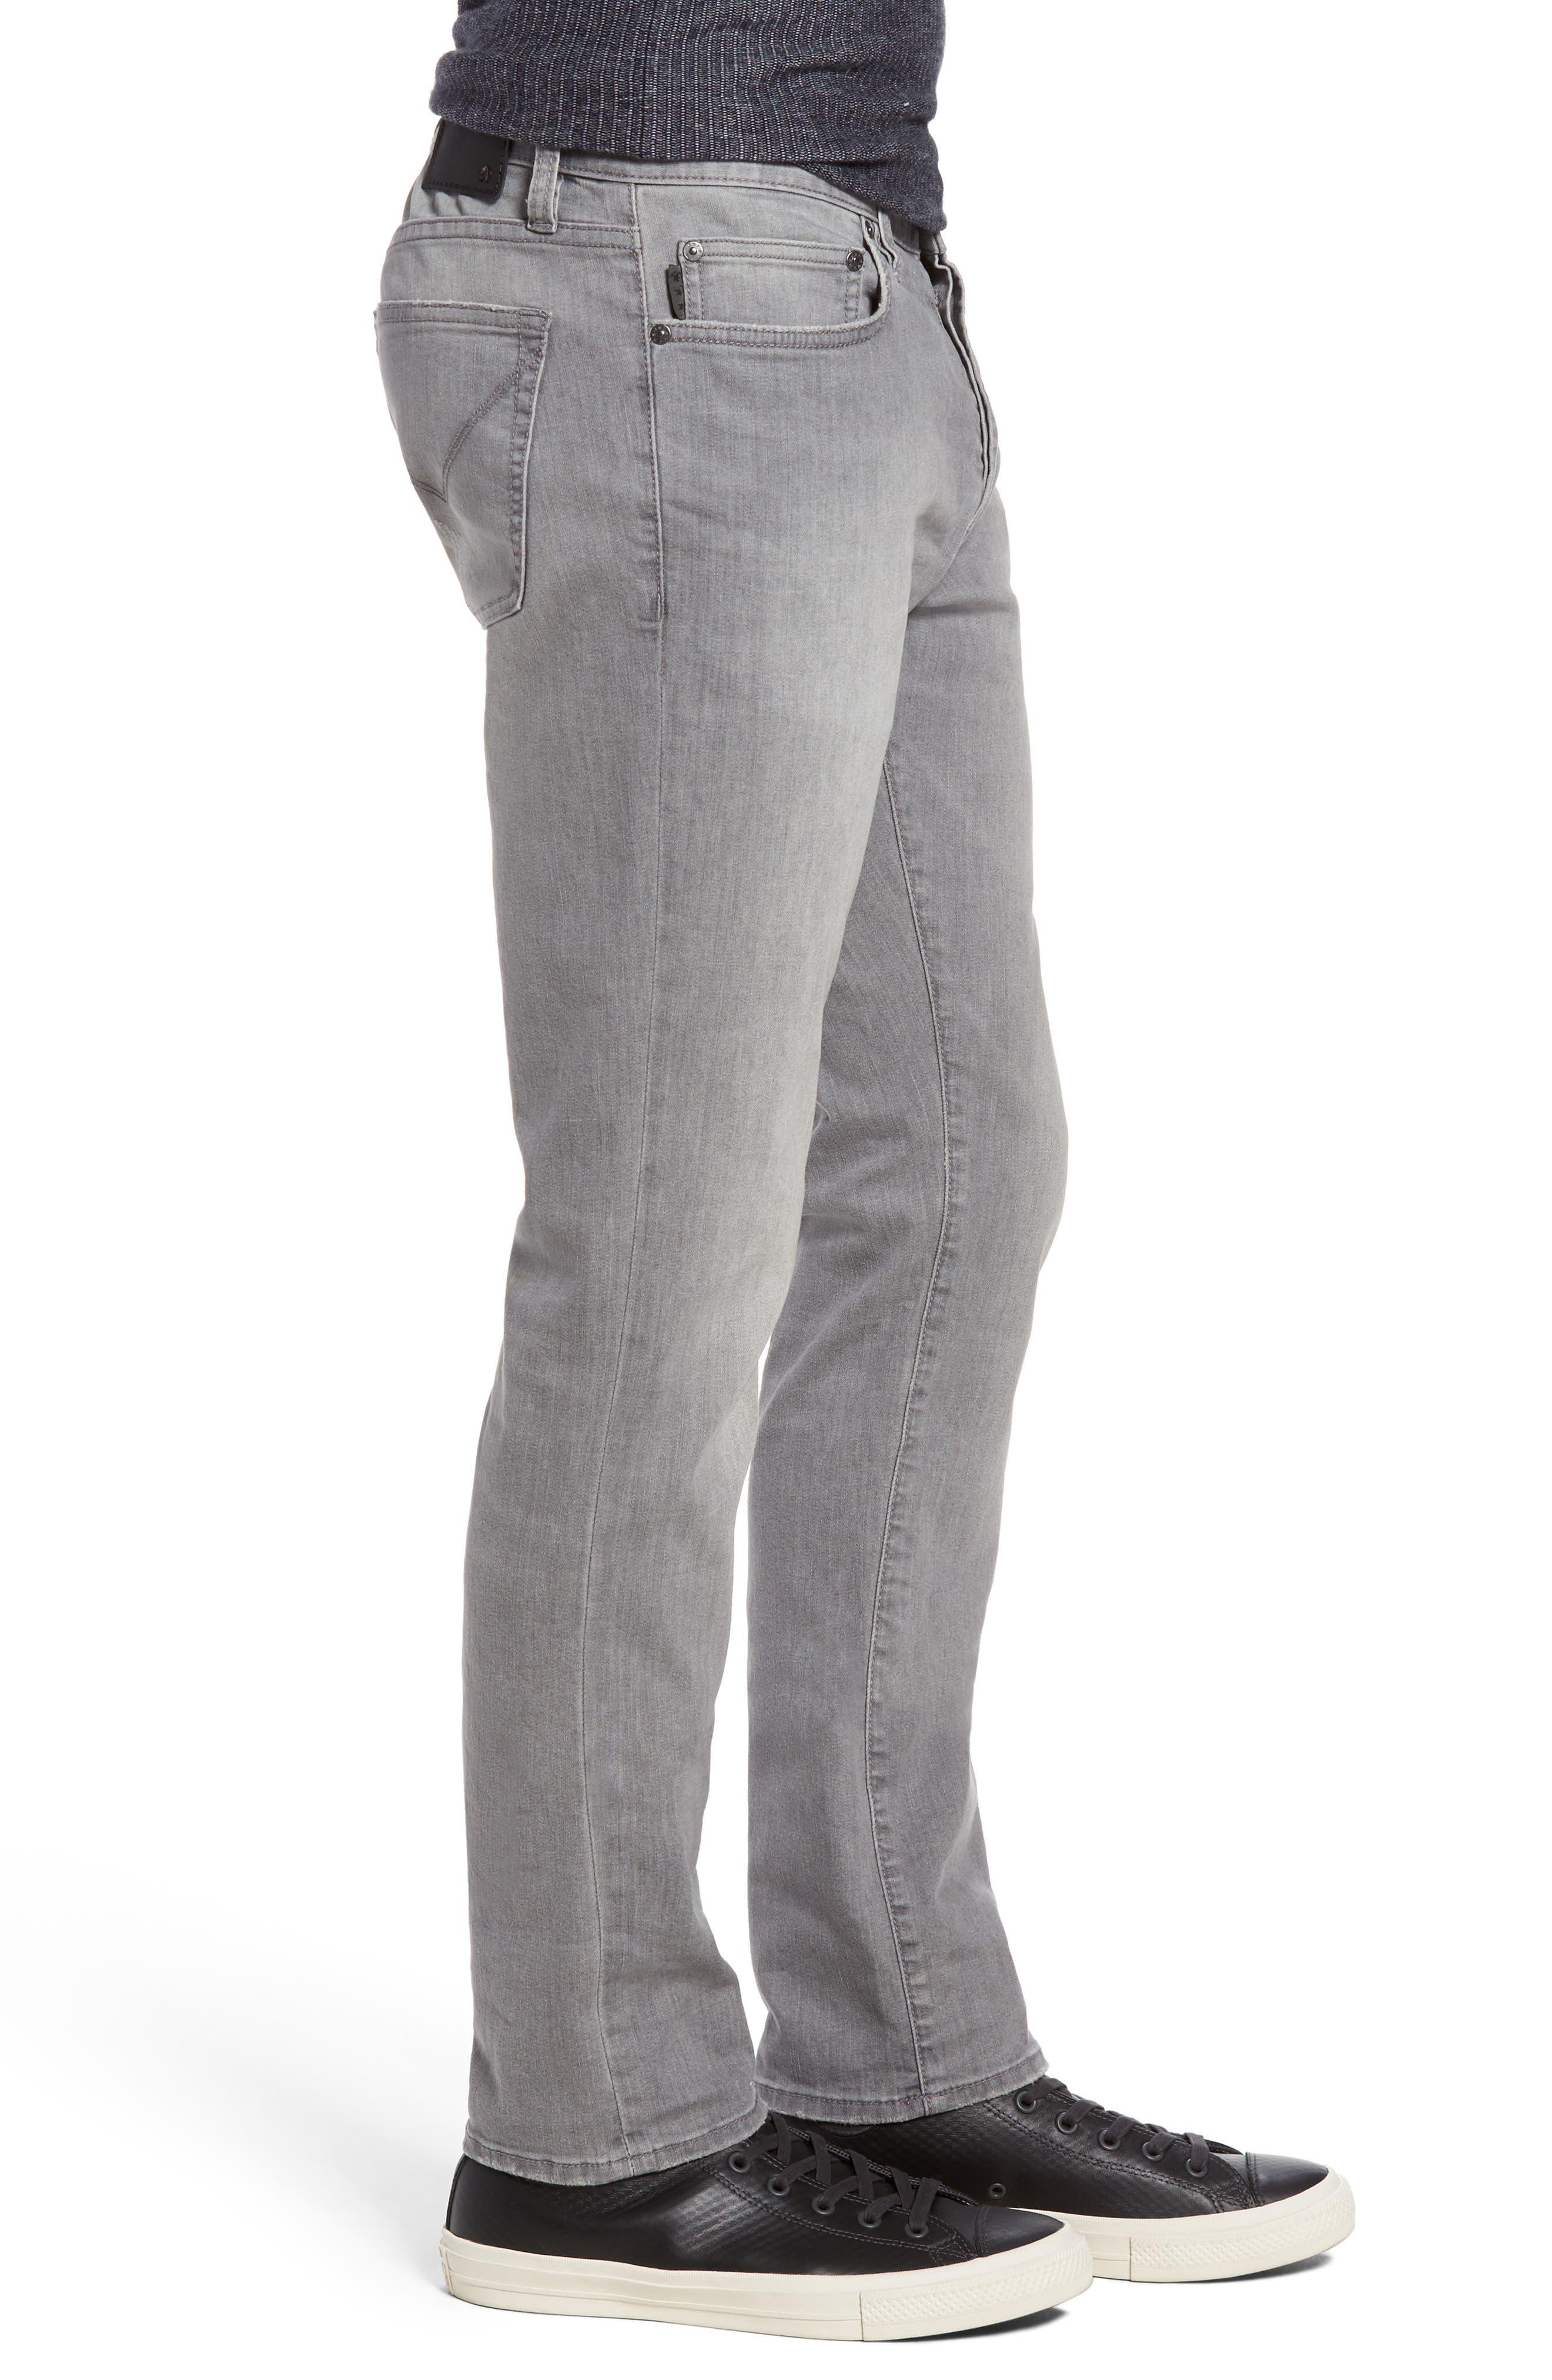 Wight Skinny Jeans,                             Alternate thumbnail 3, color,                             Medium Grey